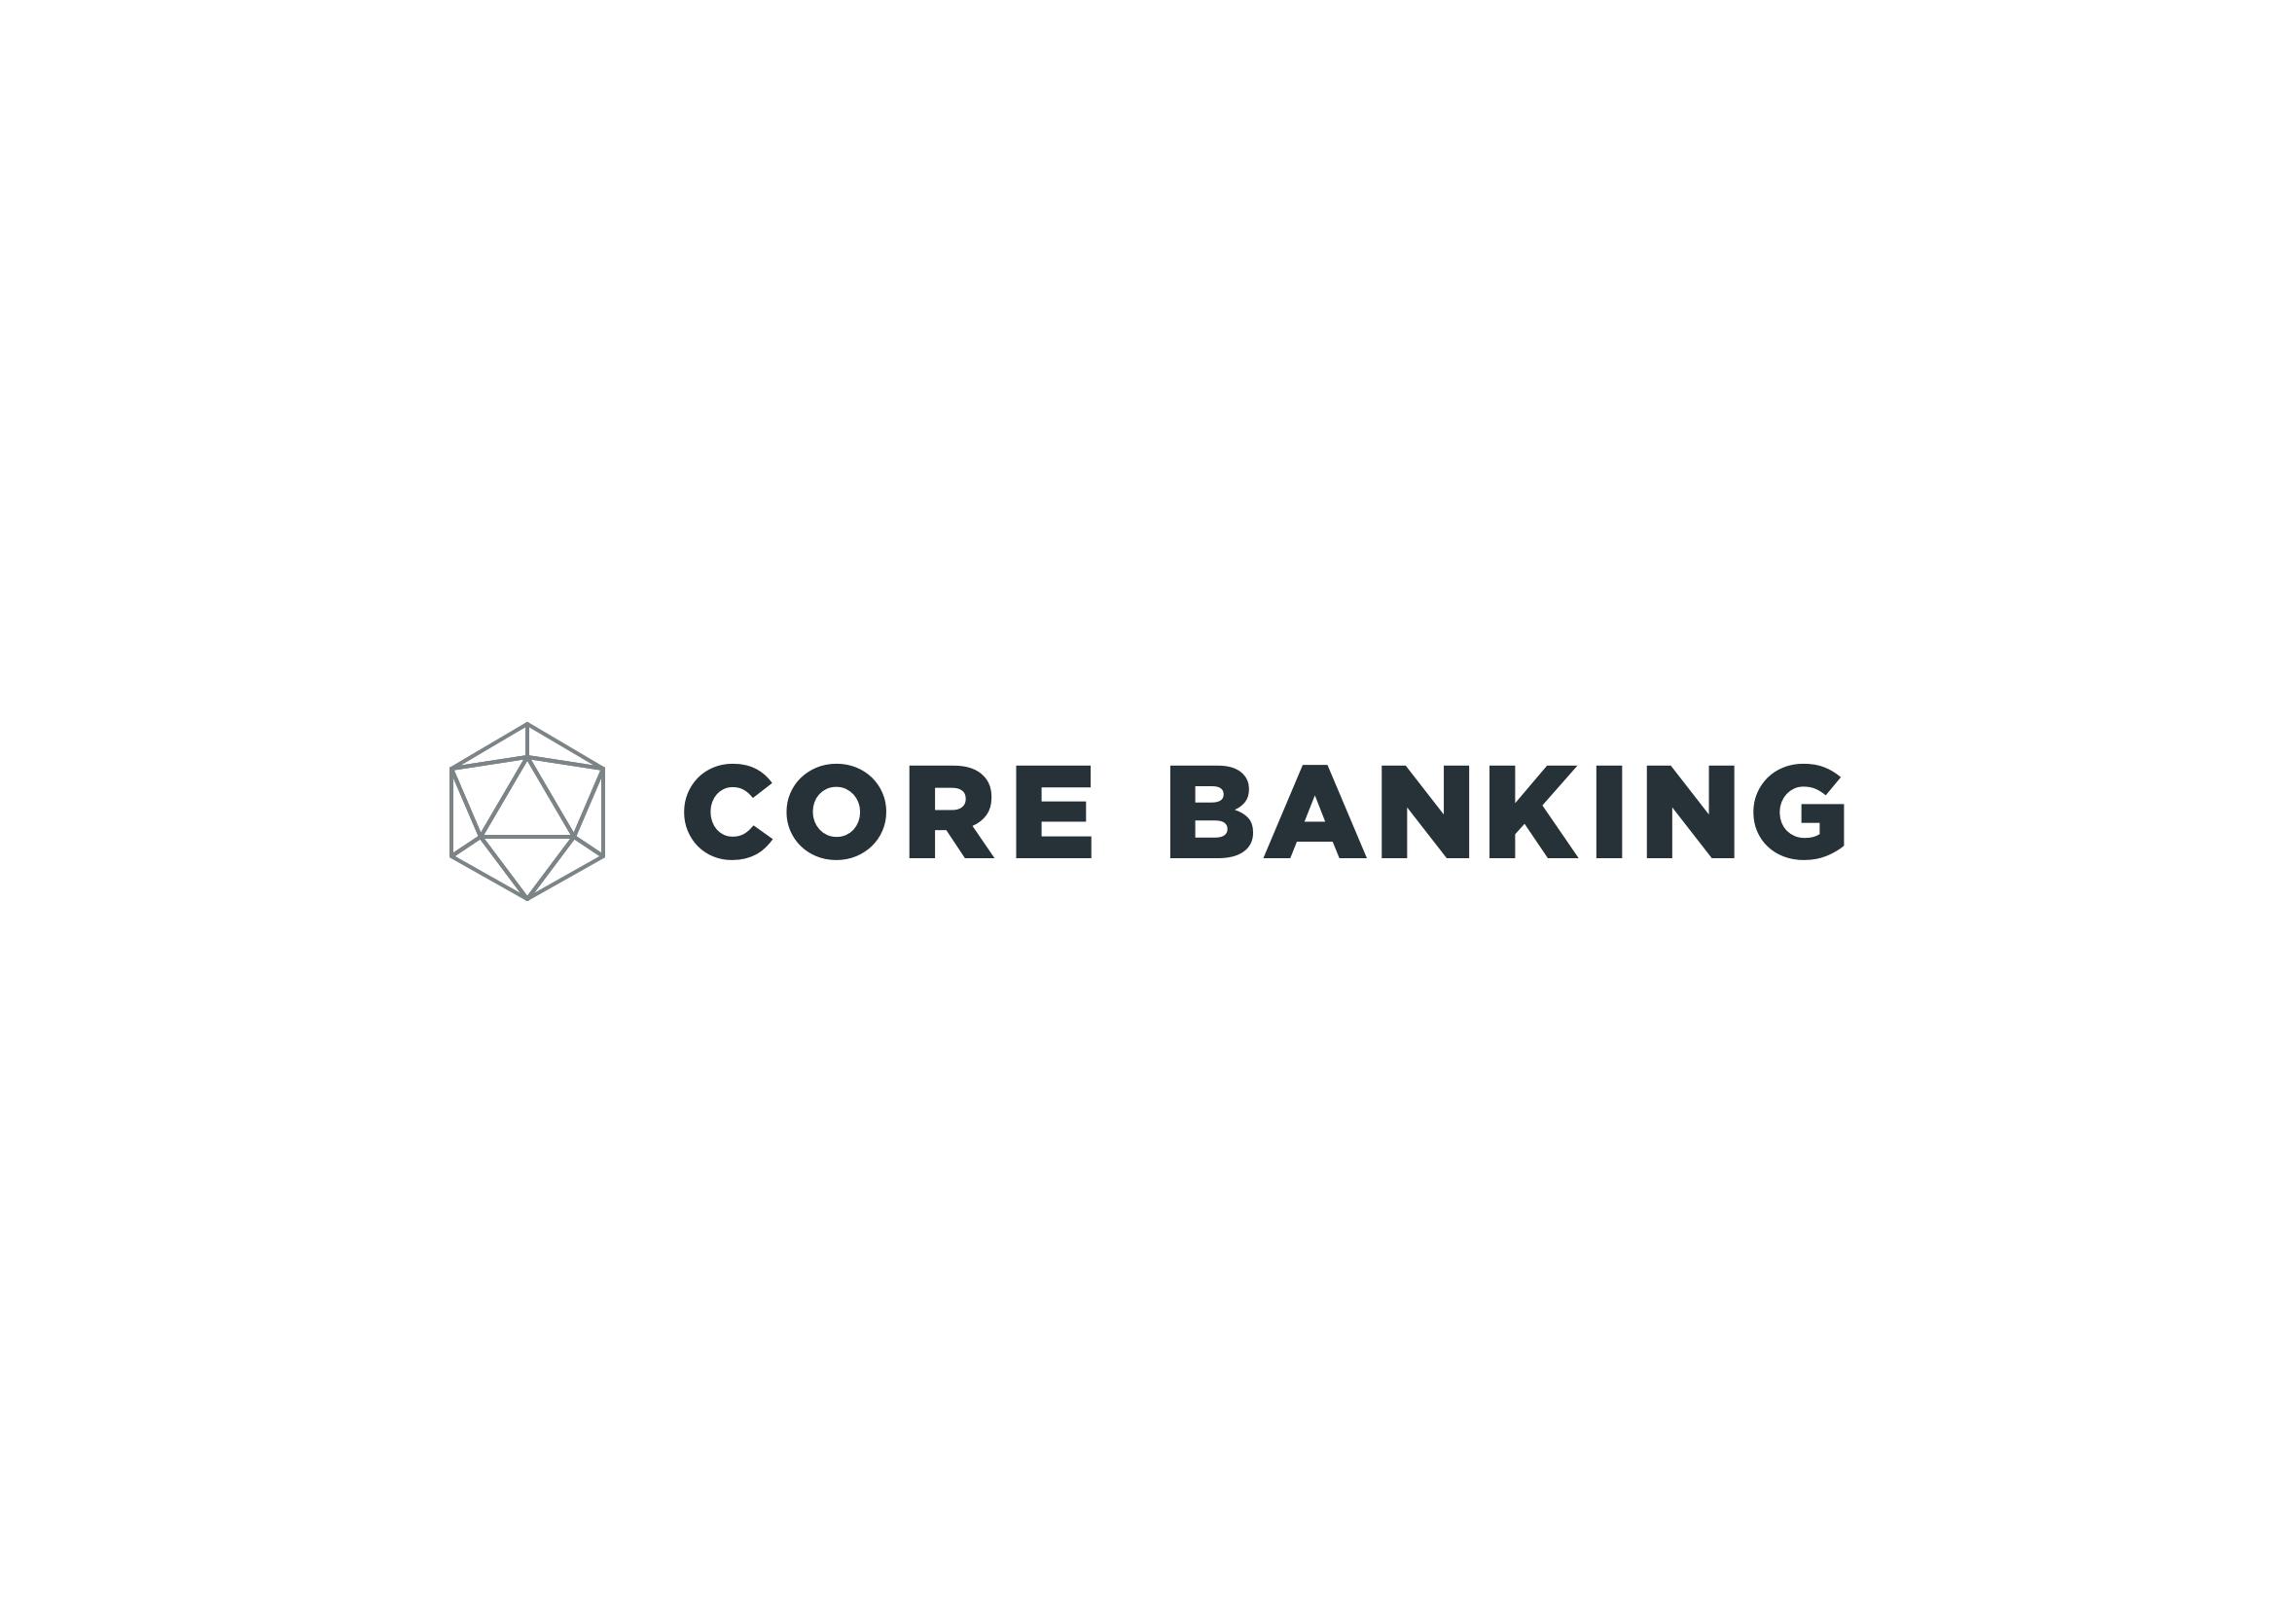 core banking logo